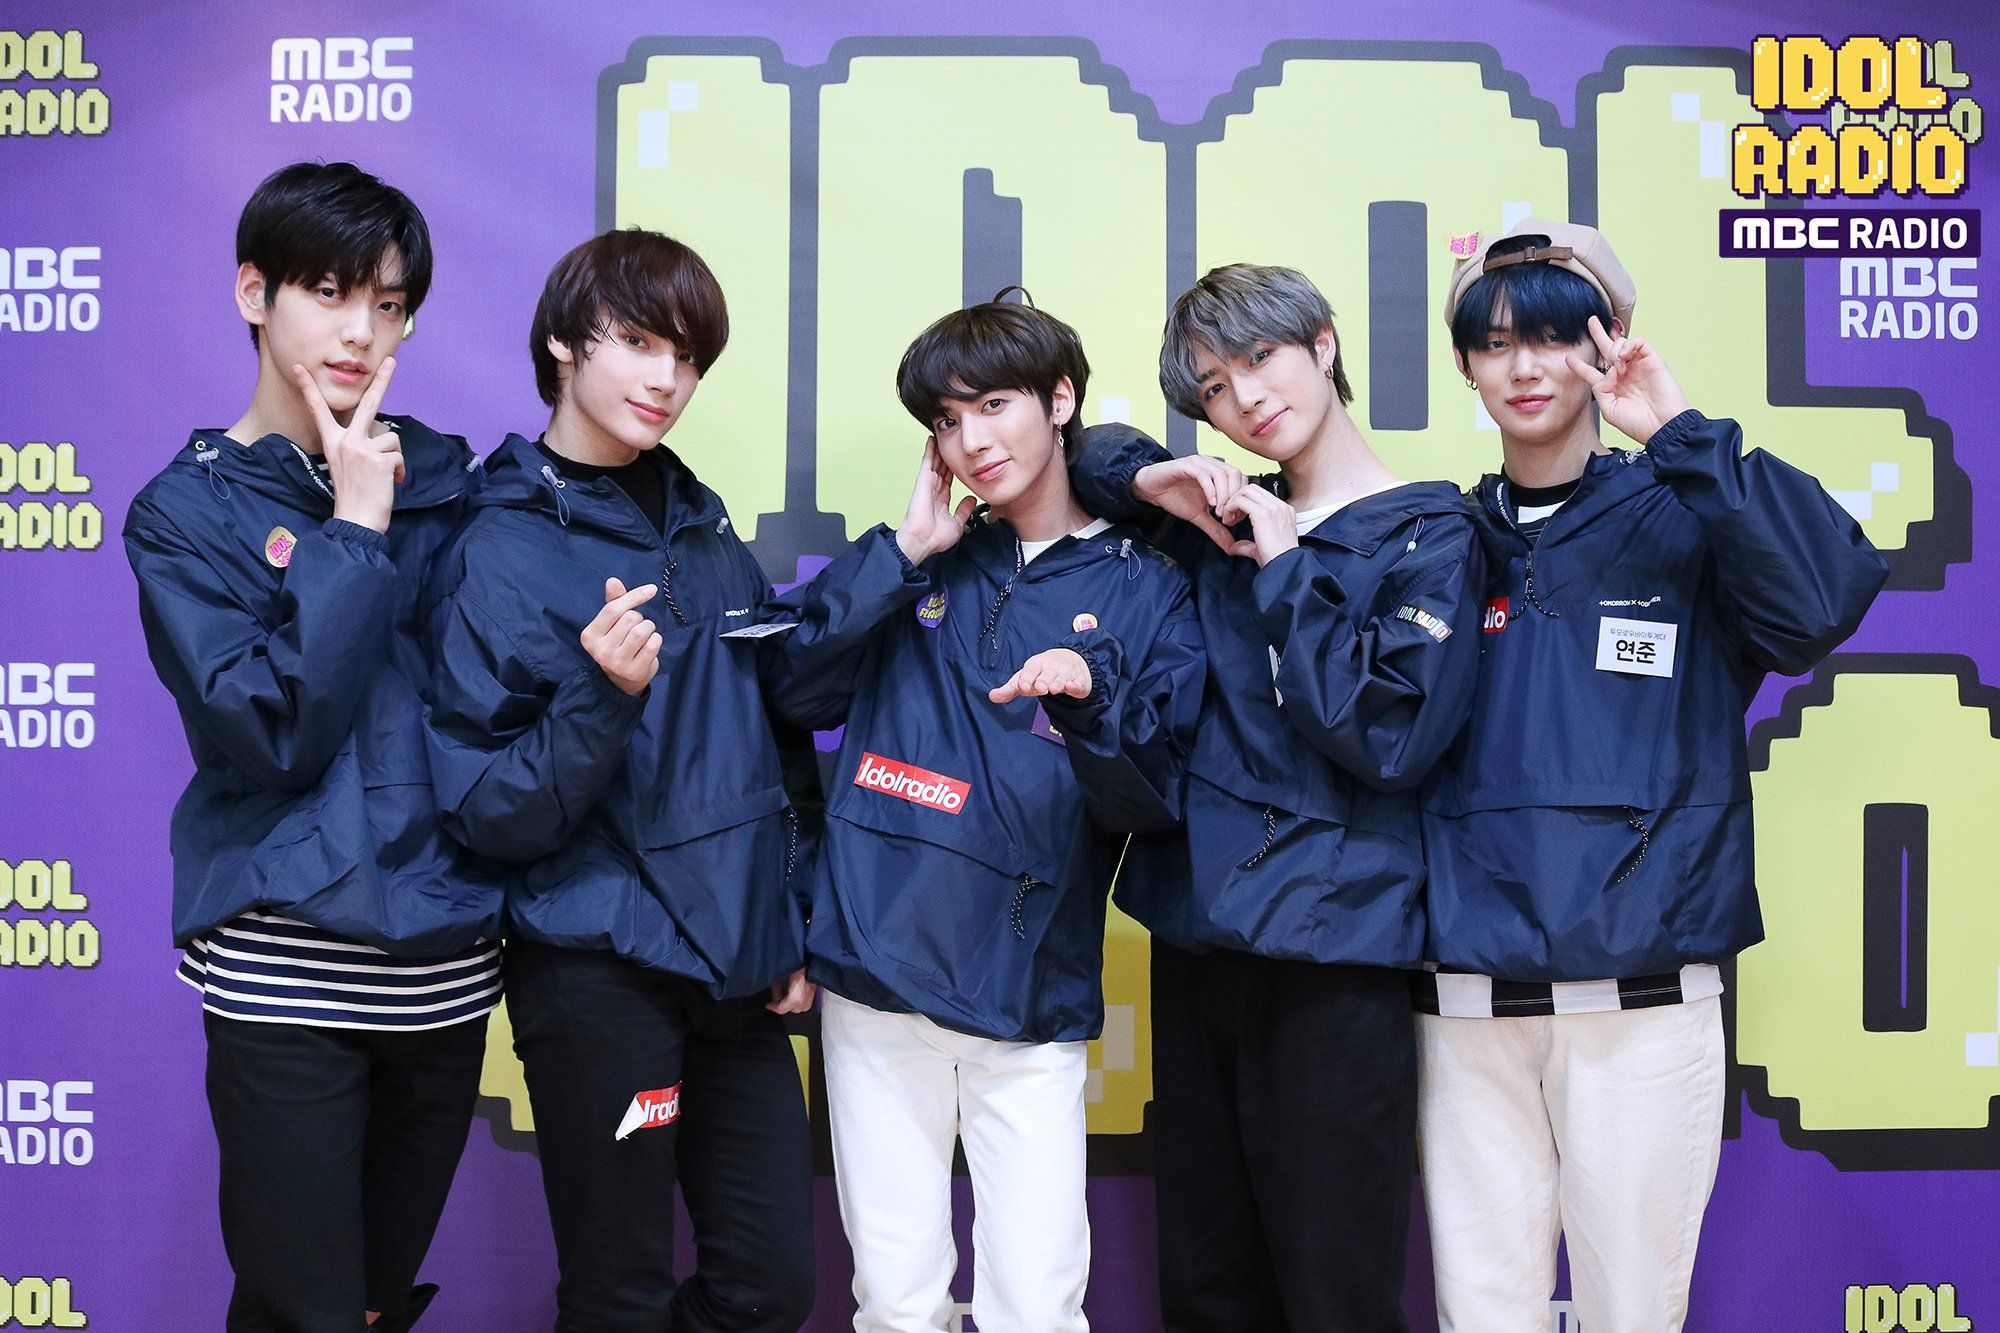 MBC 아이돌라디오 (공식계정) on in 2020 Boy bands, Boy groups